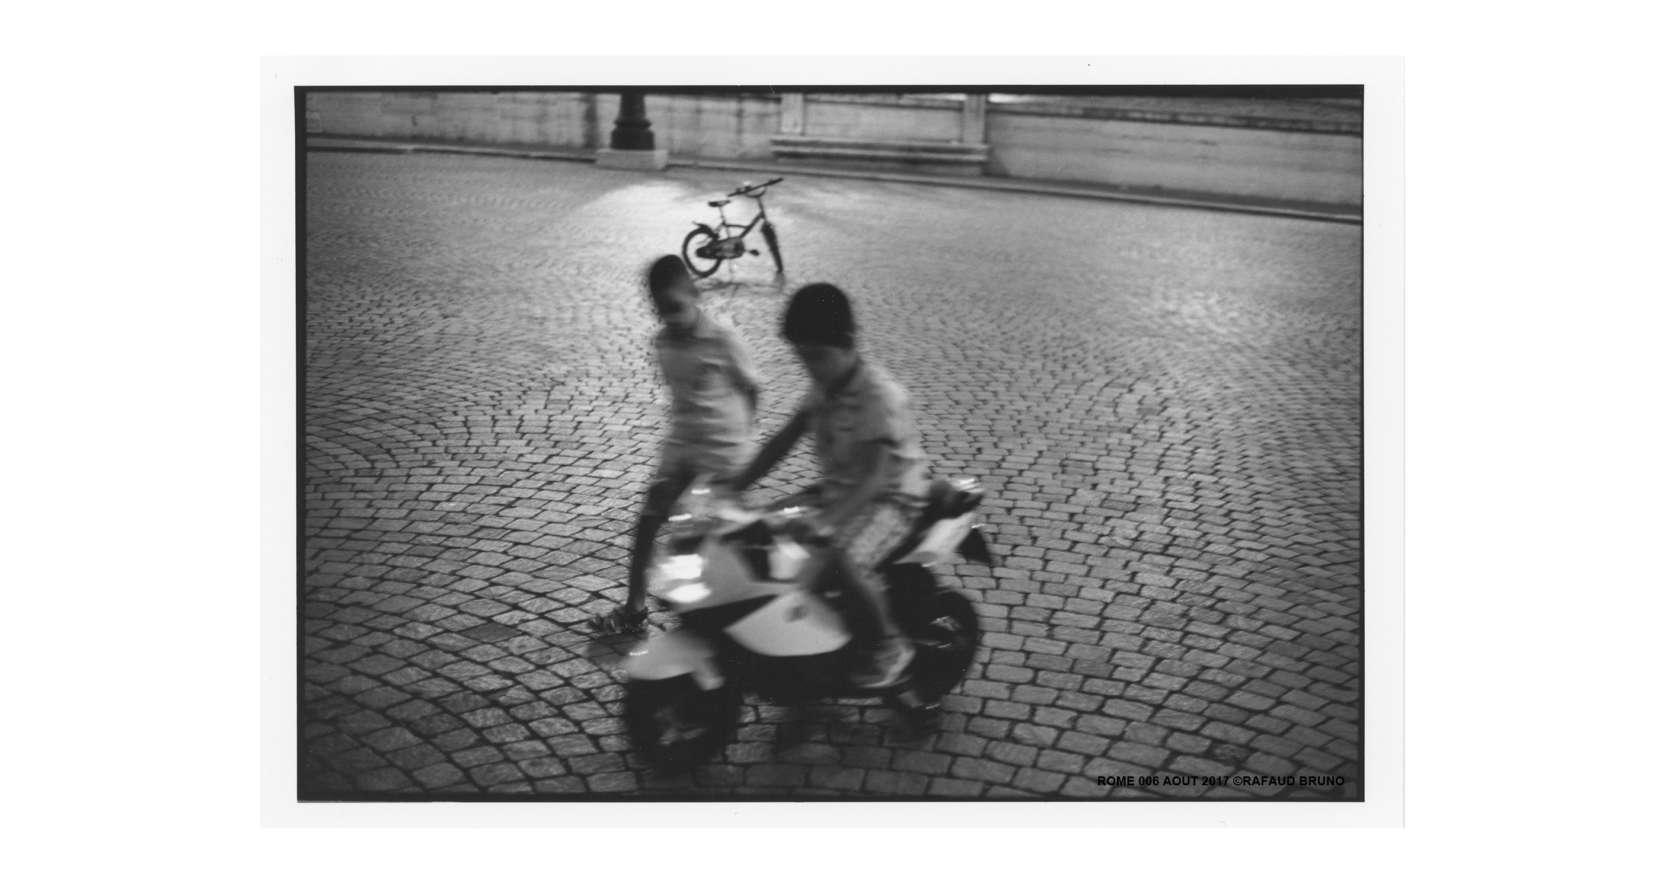 09A-Bruno-Rafaud--1660x889.jpg